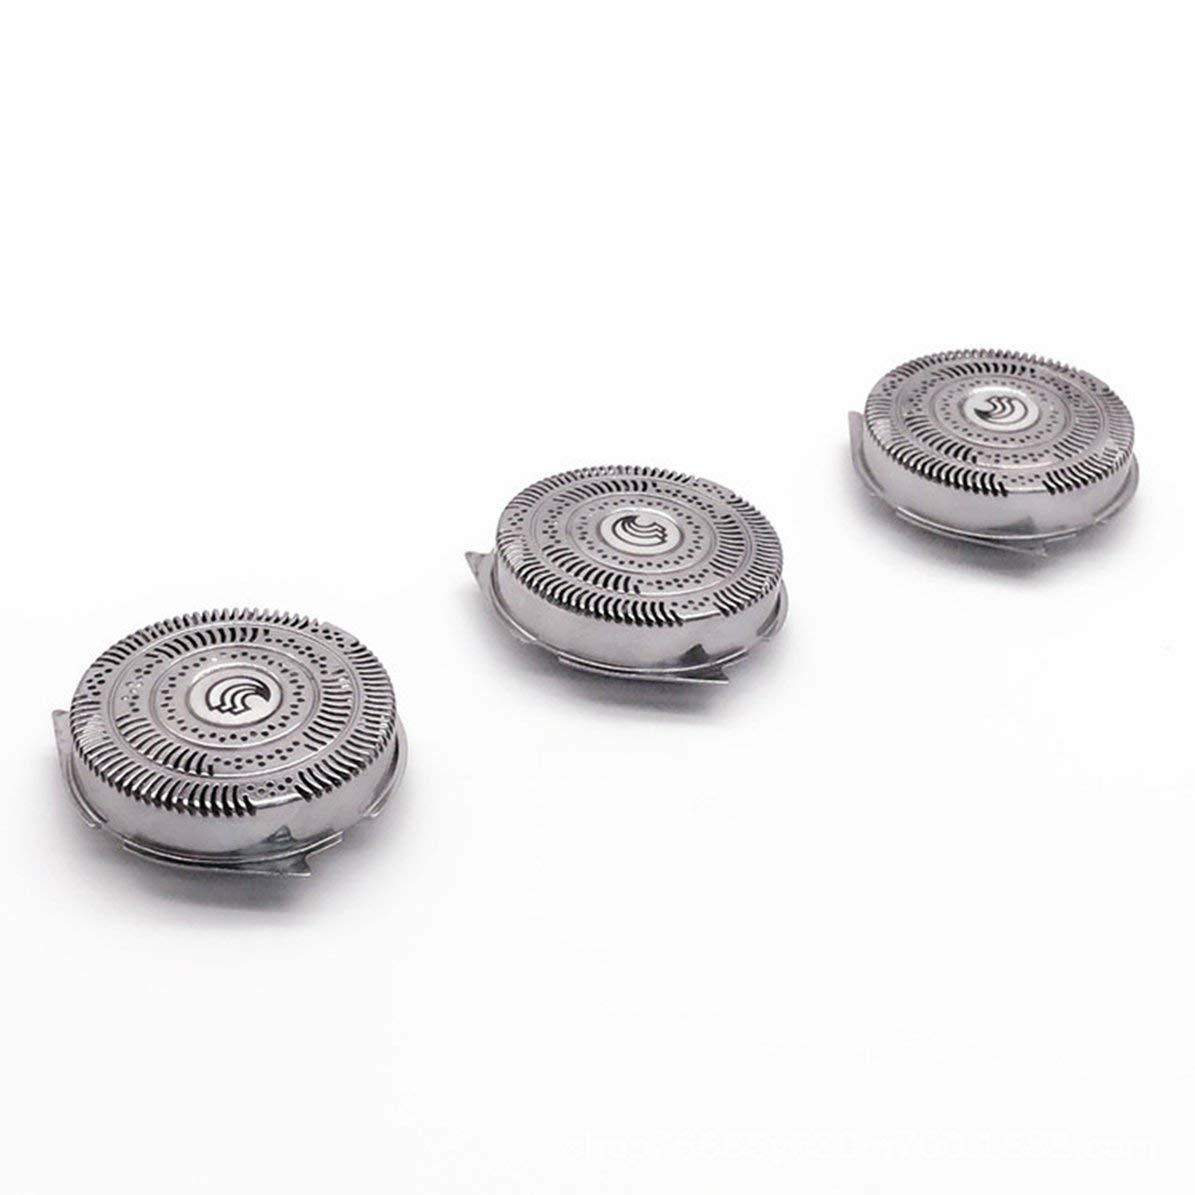 3 piezas de afeitar cuchillas de afeitar Cabezales de afeitado de reemplazo en forma para Philips HQ9070 HQ9080 HQ8240 / 8260 Accesorios de la máquina de afeitar rotativa PT920 DoMoment